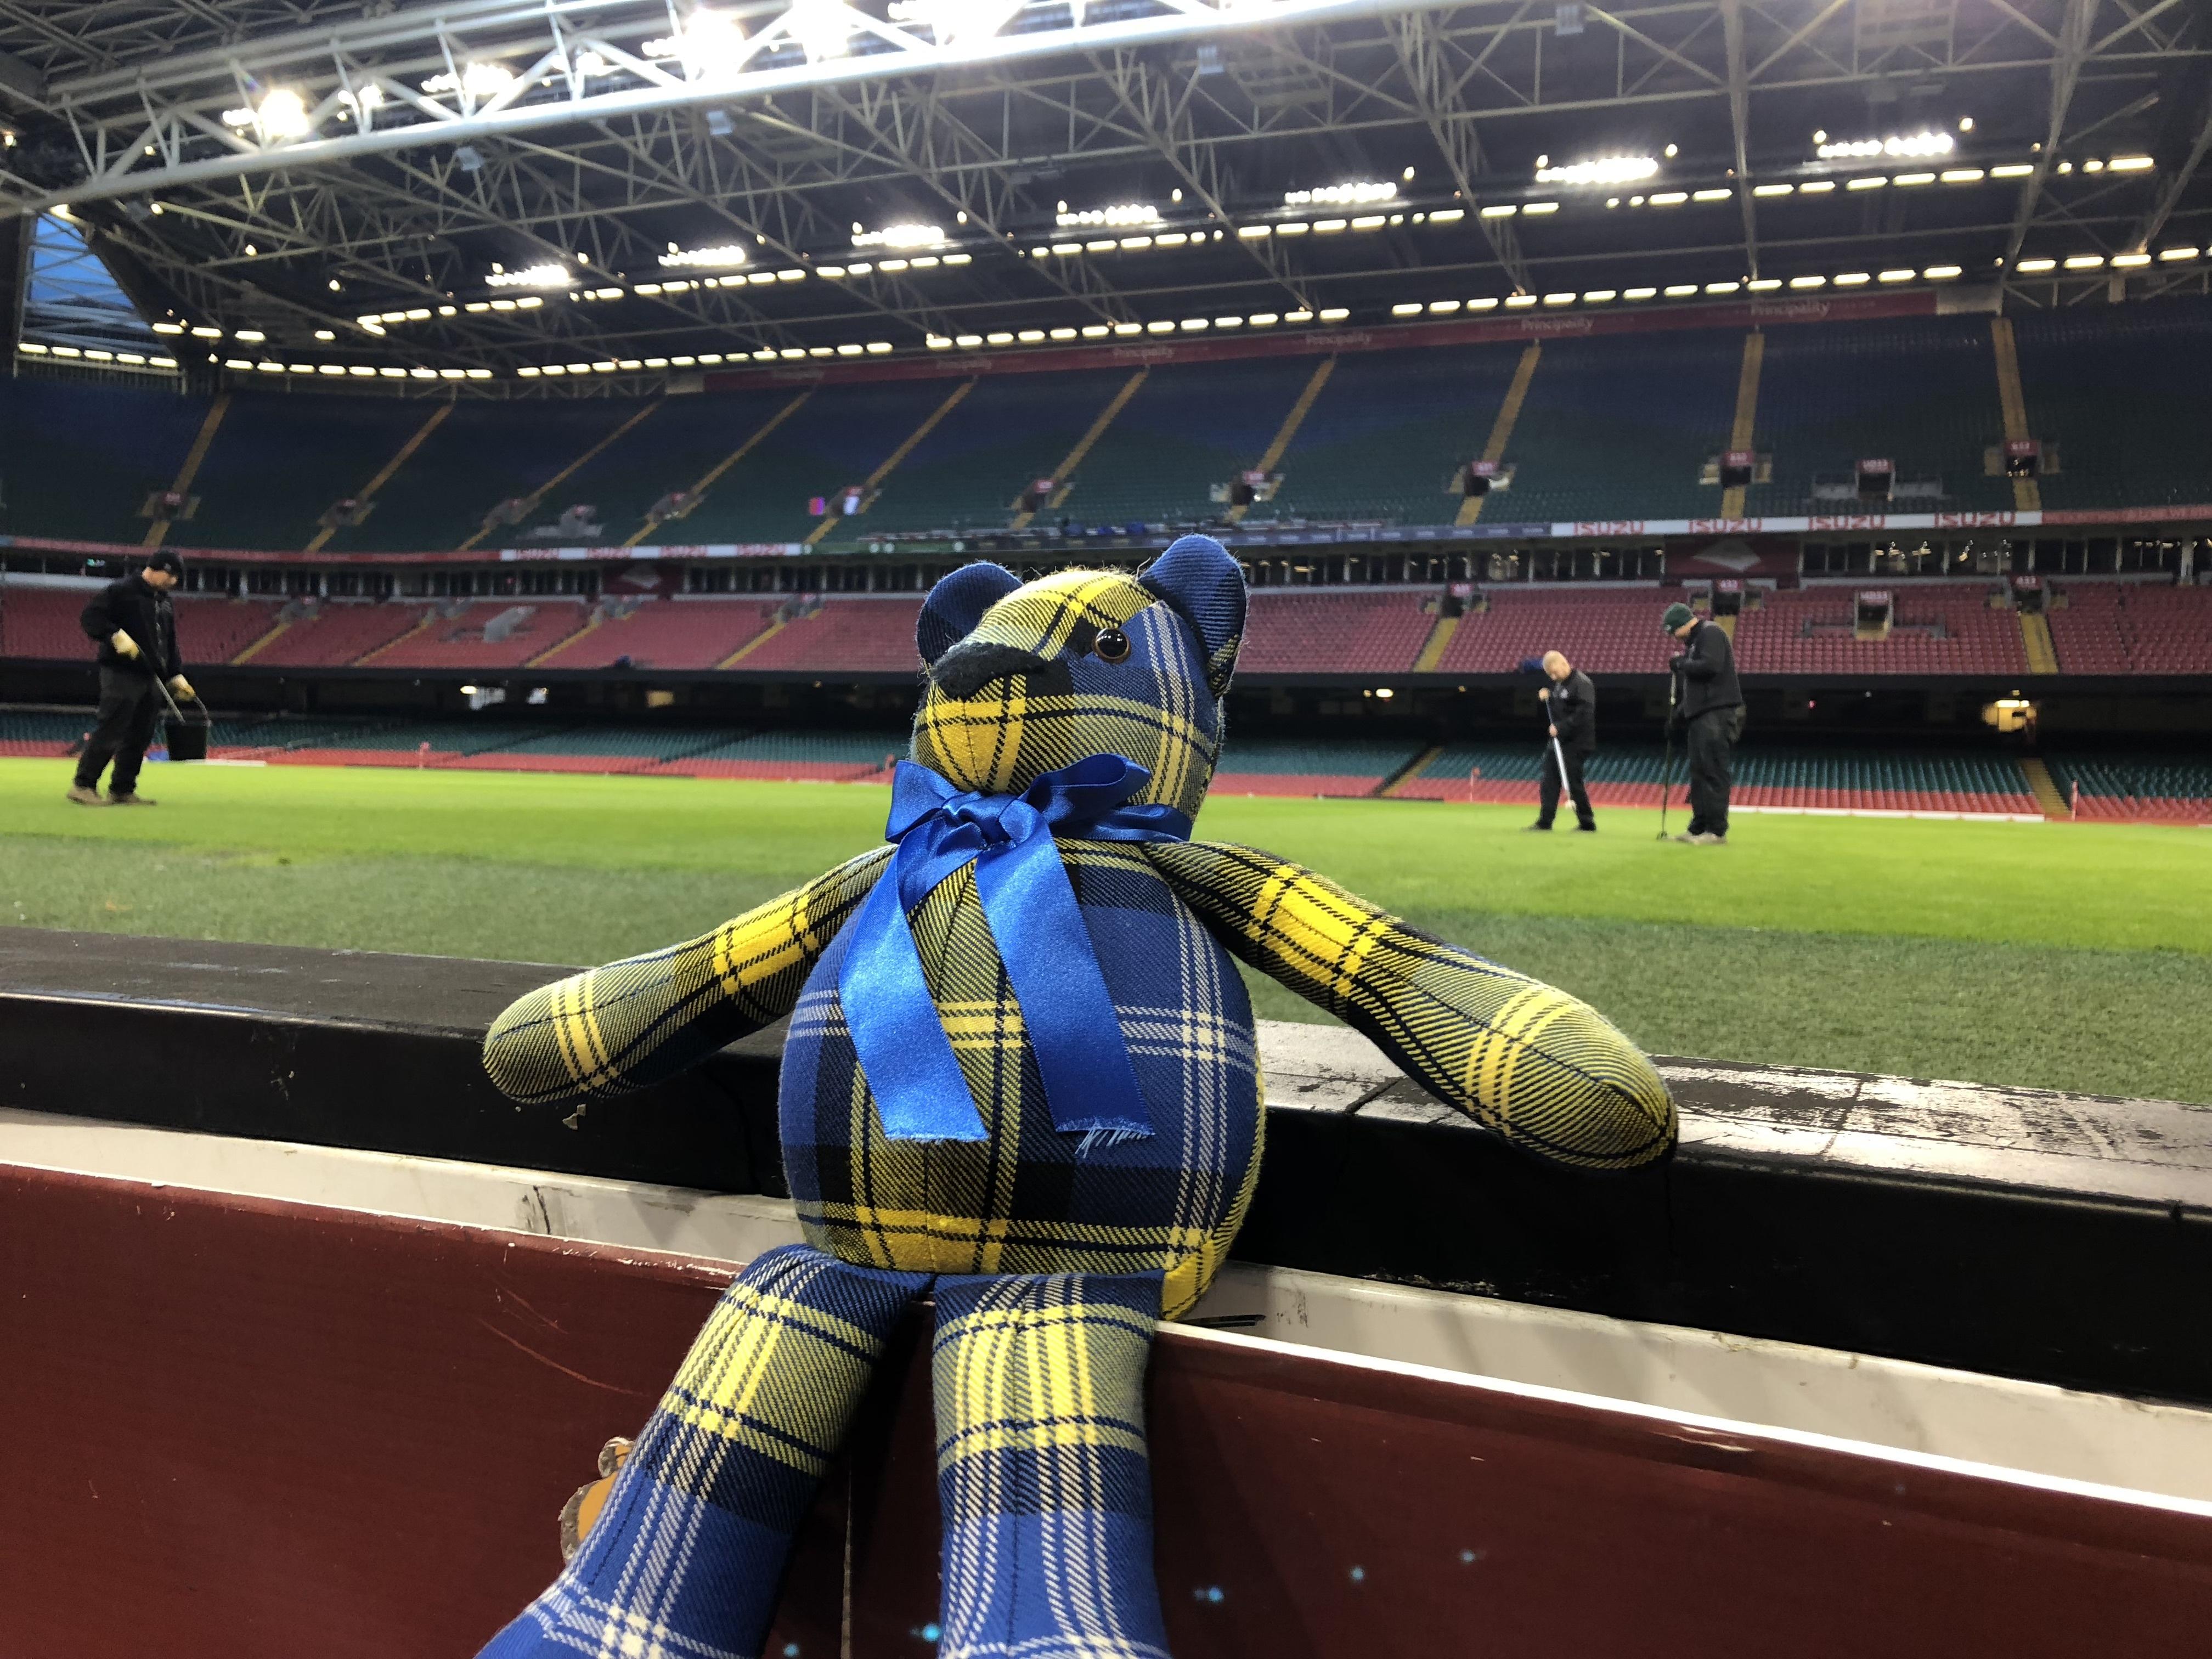 Doddie'5 Tartan Ted - Principality Stadium